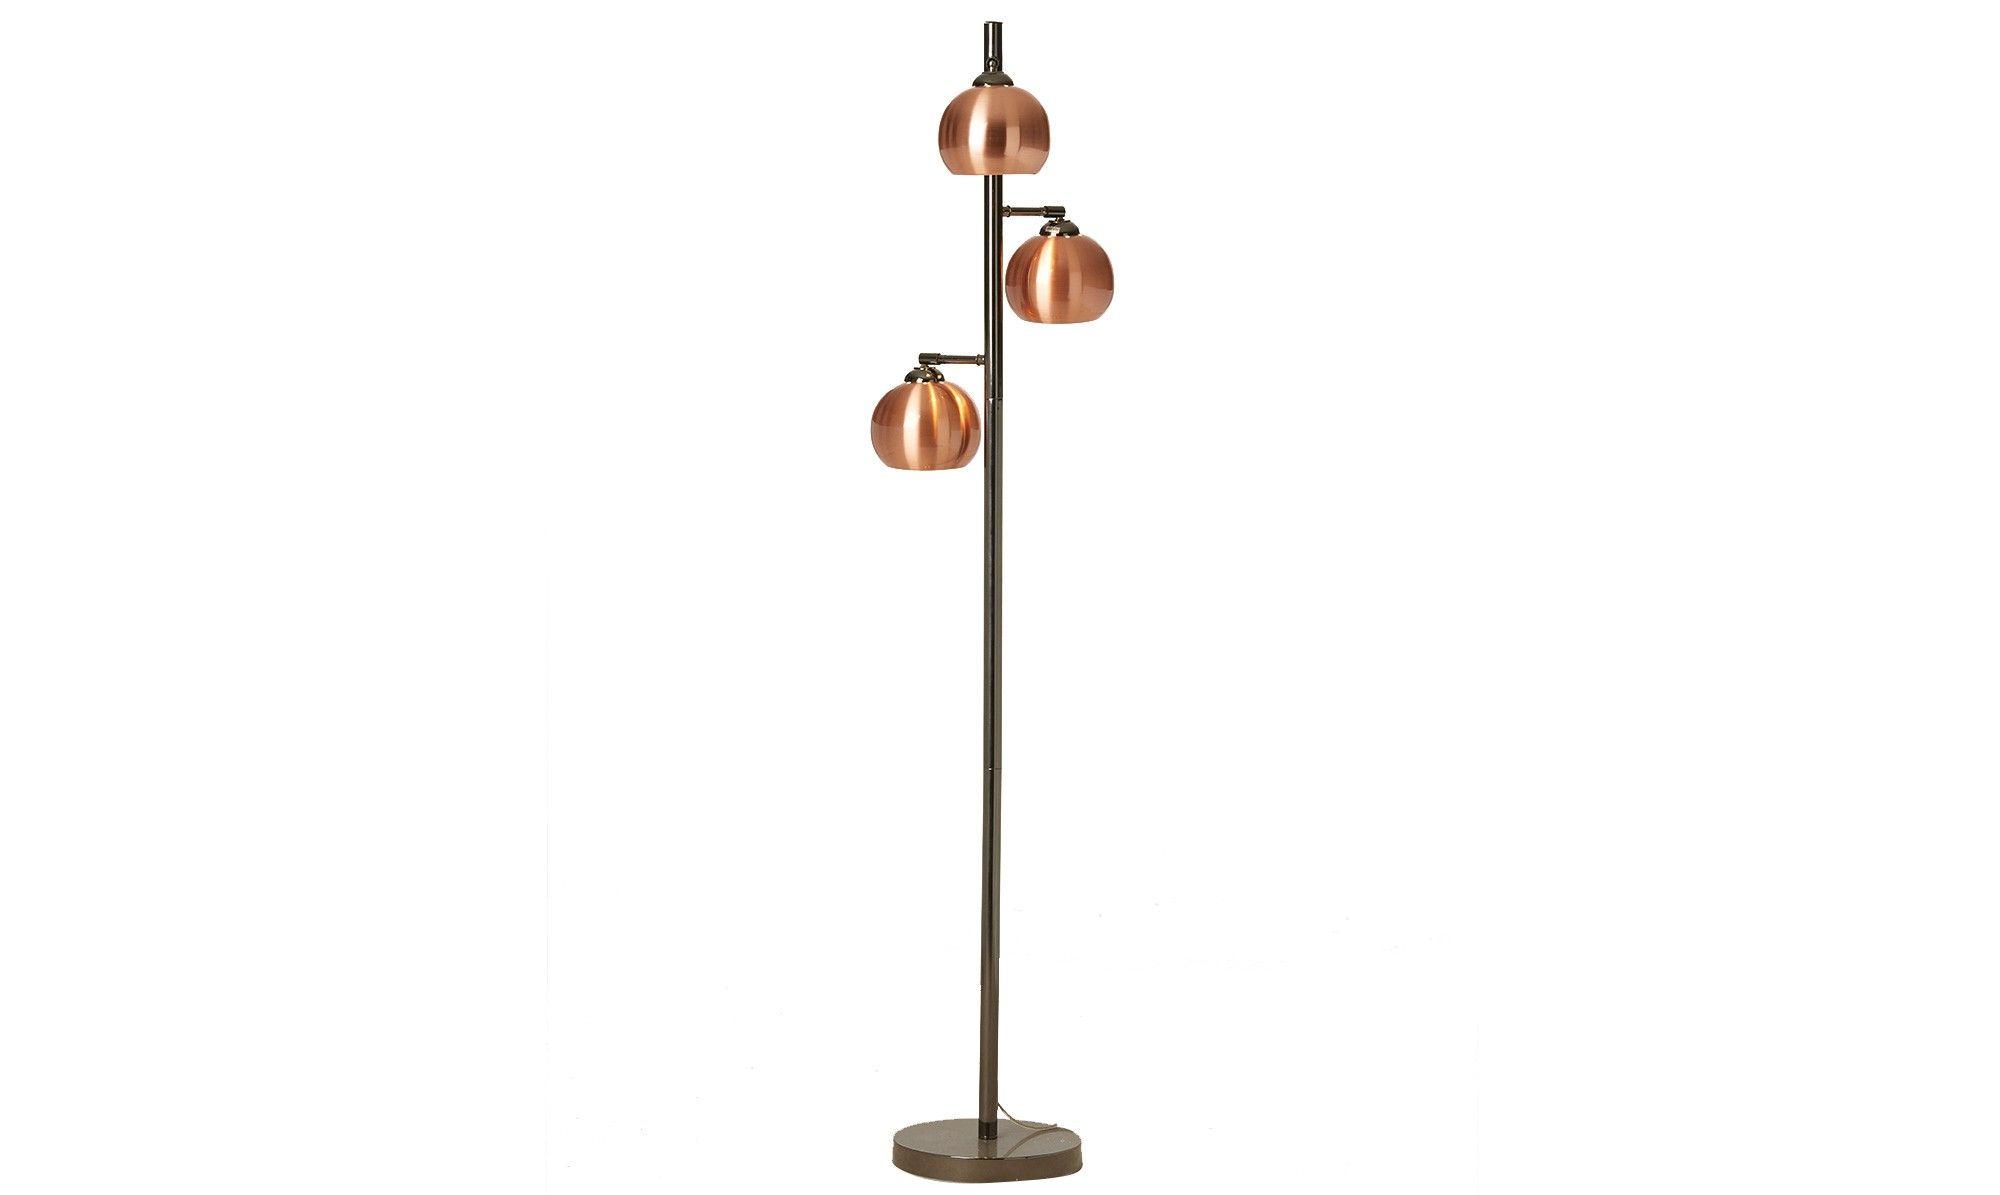 142 Reference Of Black Metal Floor Lamp Uk In 2020 Black Metal Floor Lamp Metal Floor Lamps Copper Floor Lamp